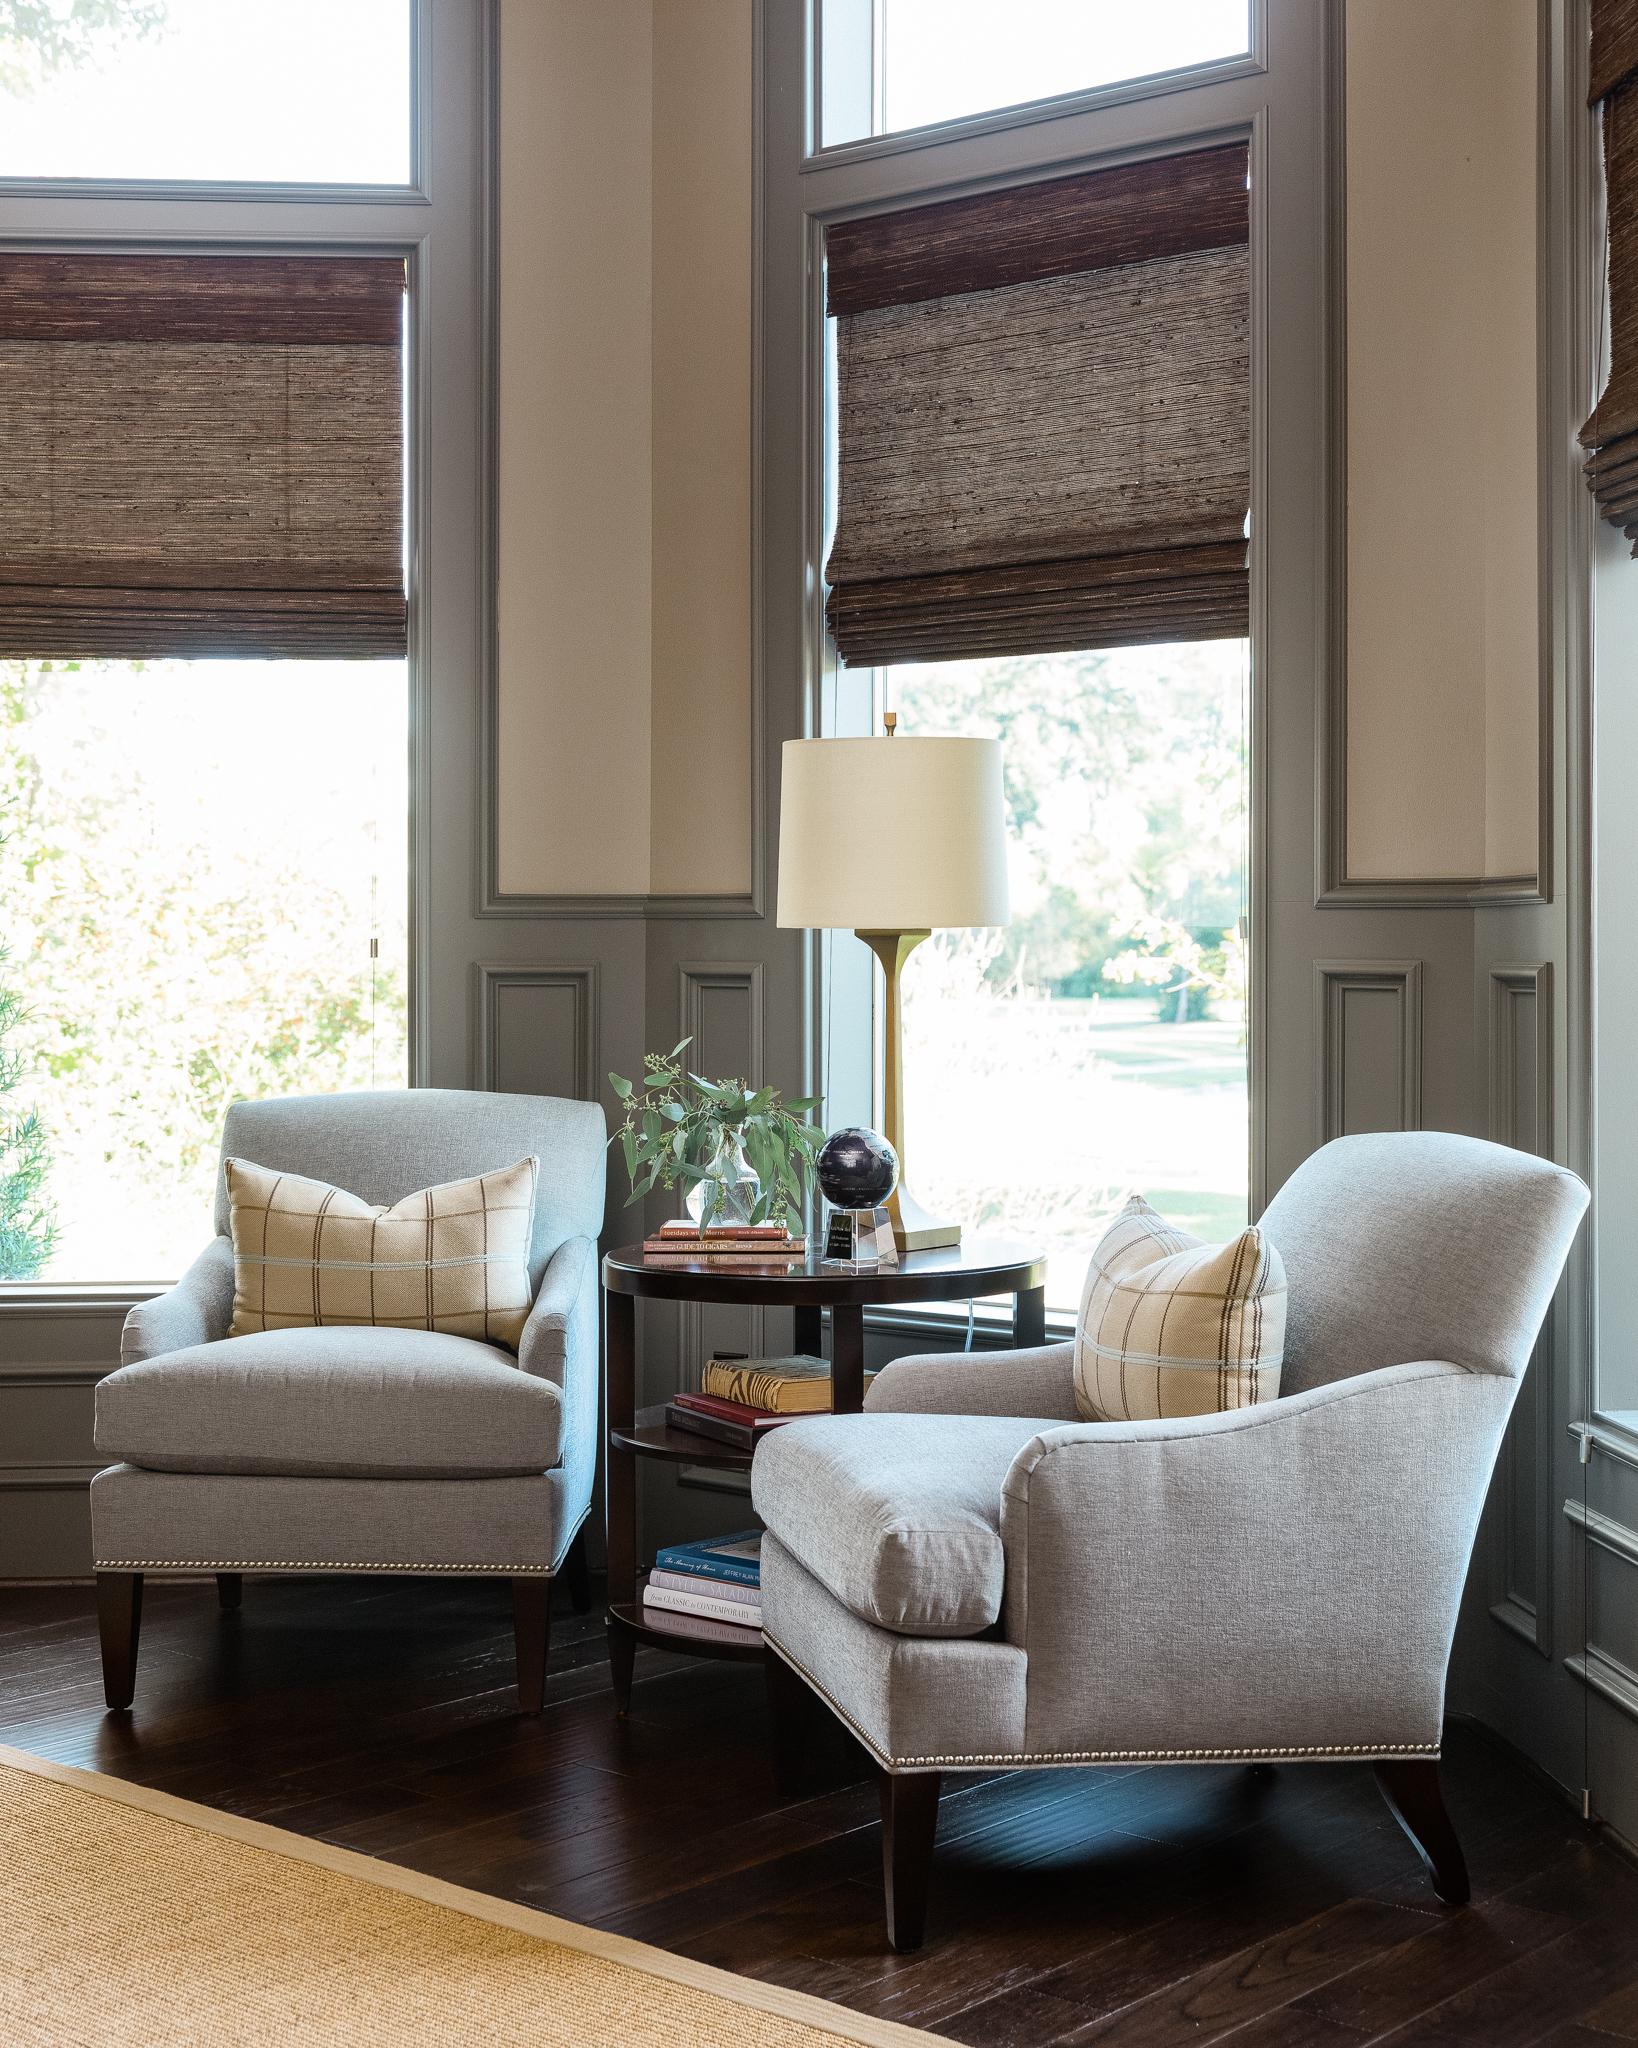 Home Office Seating   Carla Aston - Designer,  Colleen Scott - Photographer #study #homeoffice #paneling